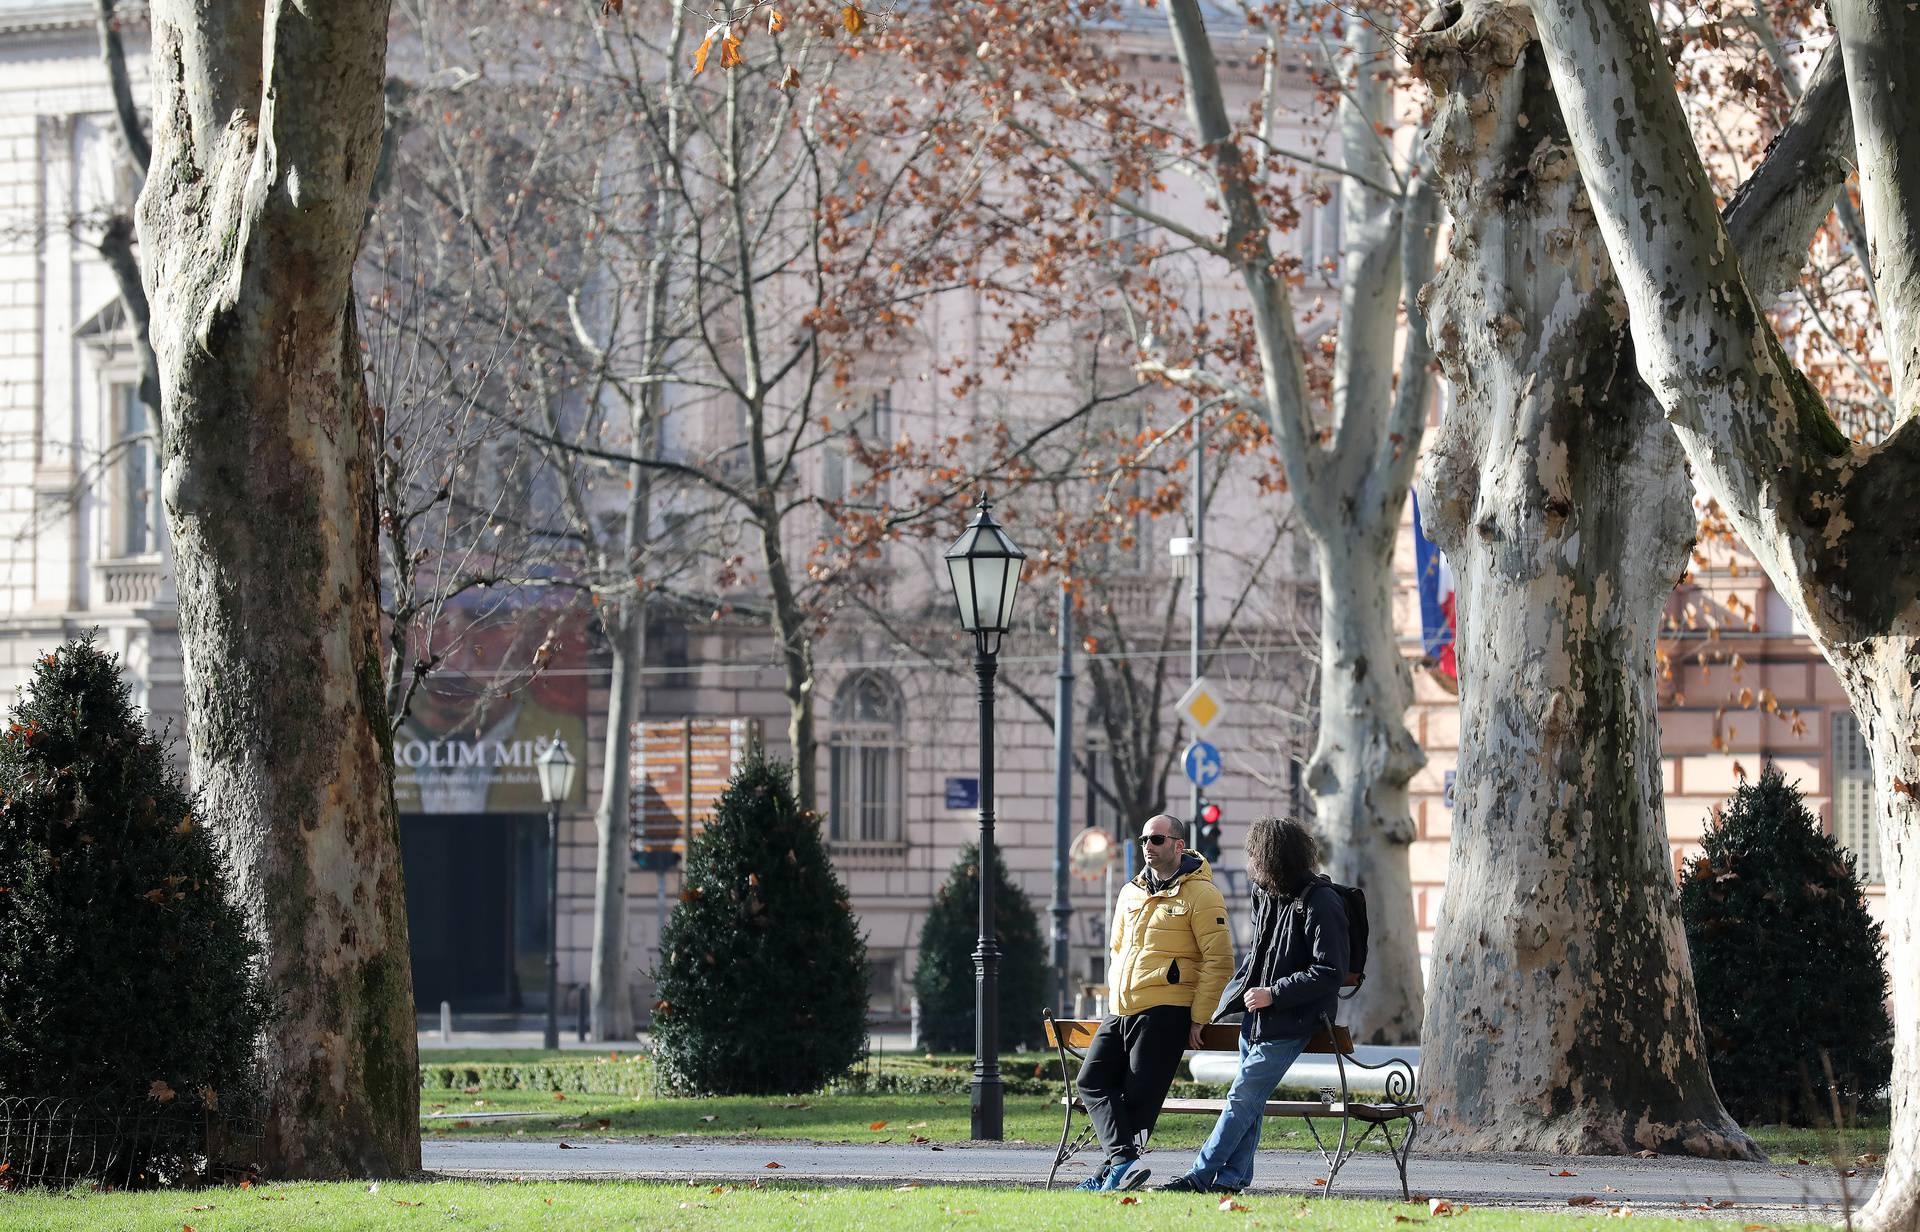 Sunčano subotnje poslijepodne idealno je za šetnju na Zrinjevcu